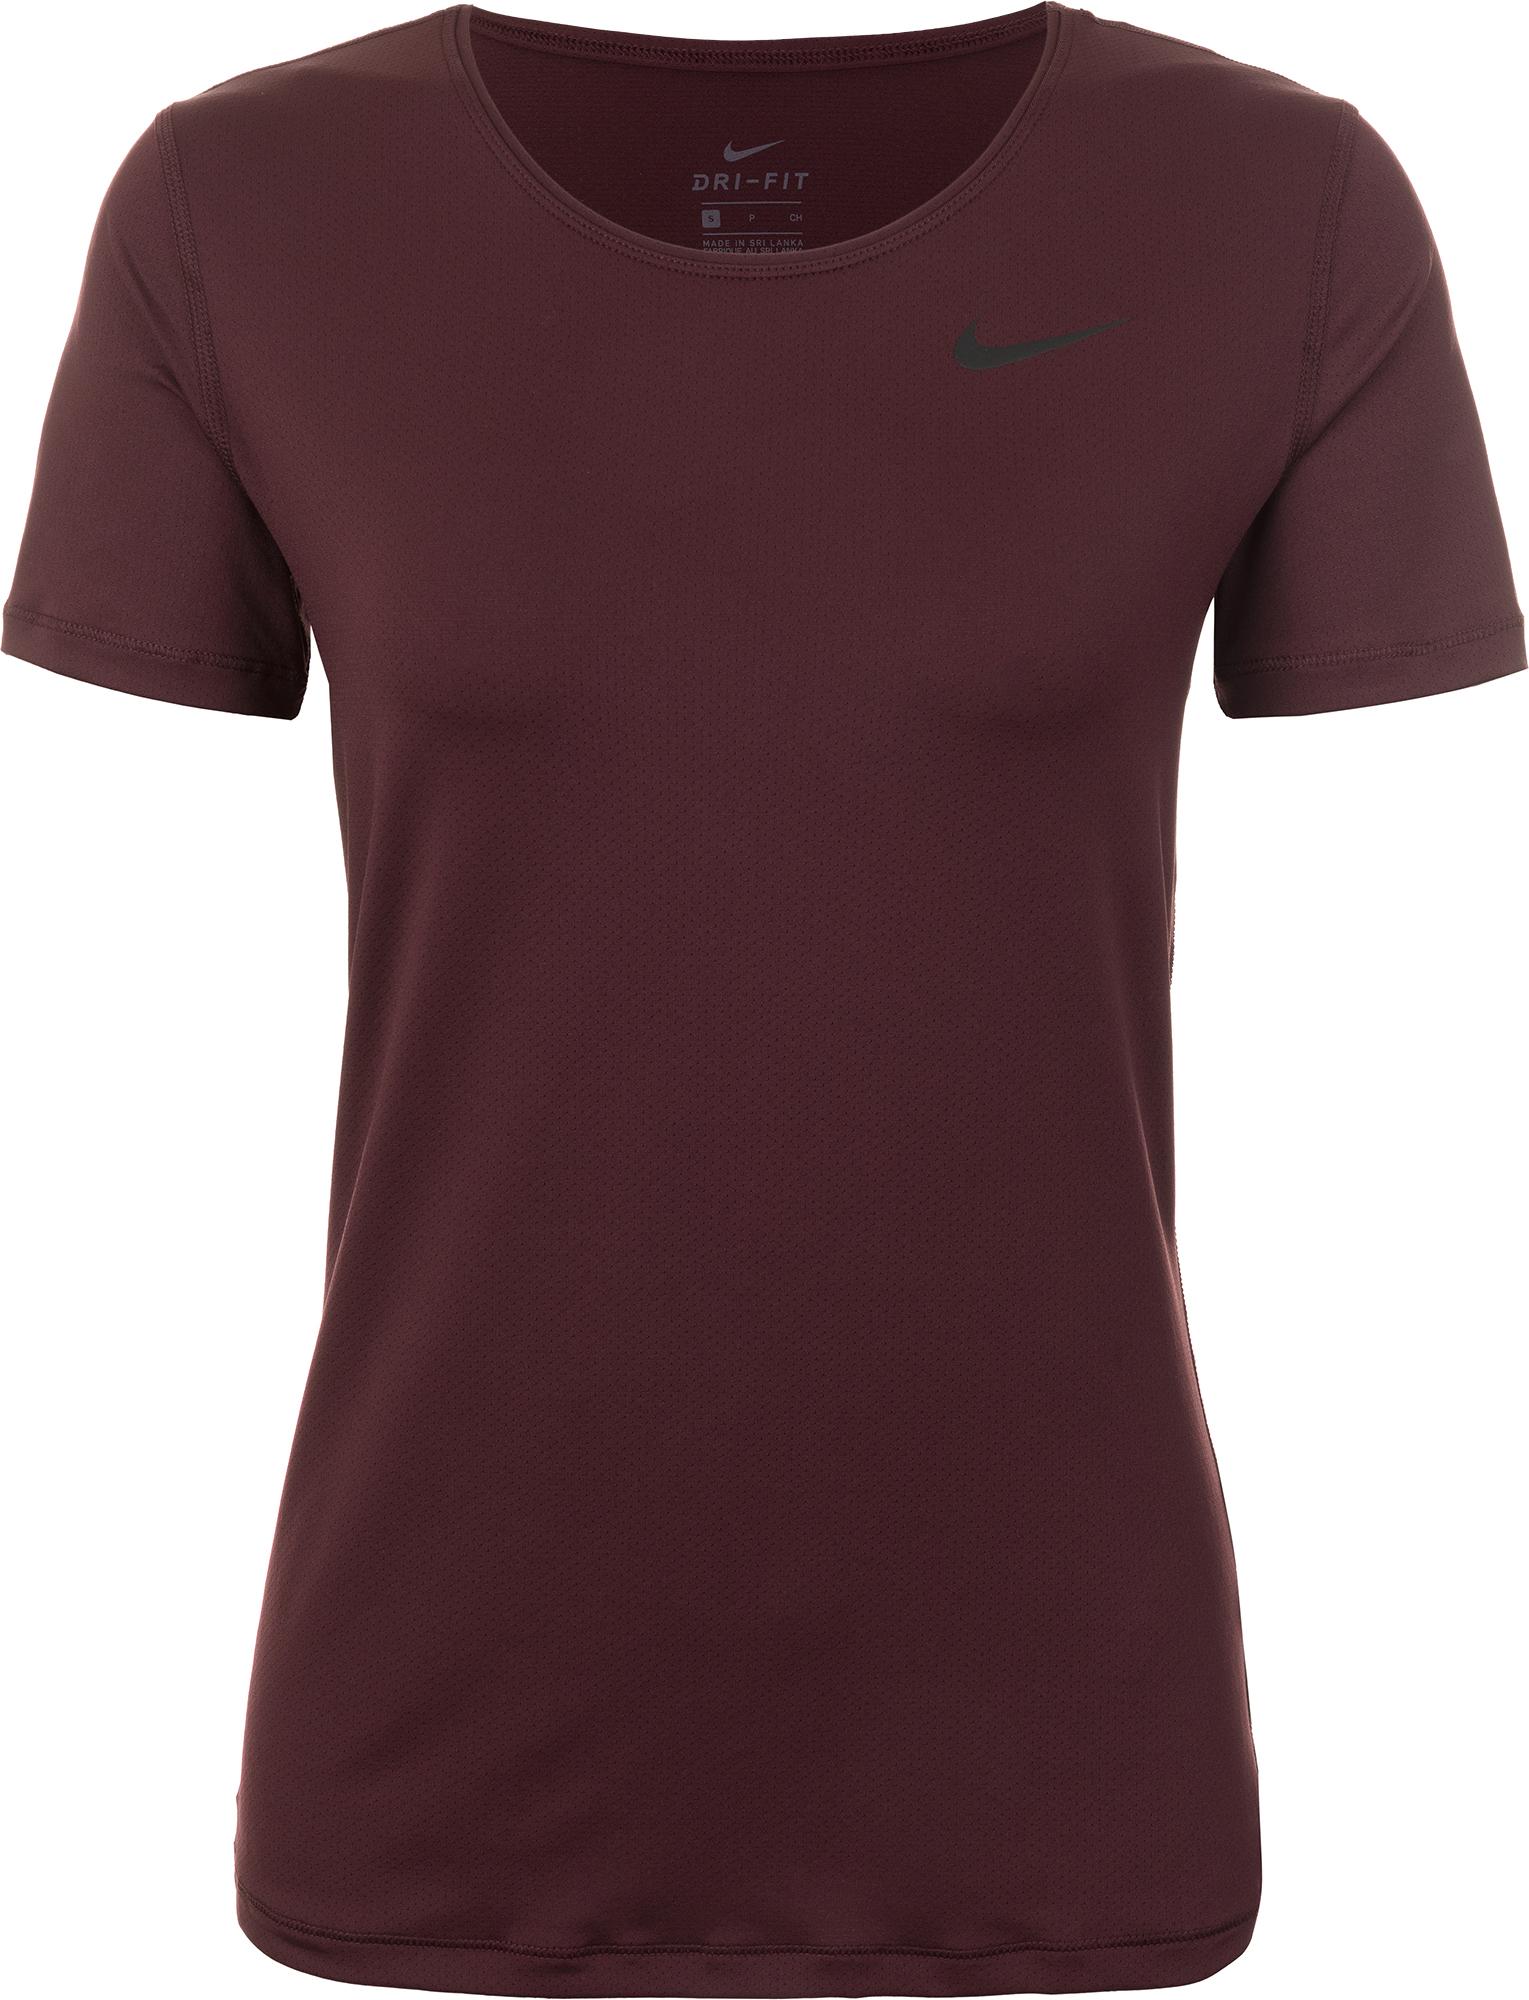 Nike Футболка женская Nike Pro, размер 40-42 футболка женская nike pro top цвет белый 889540 100 размер s 42 44